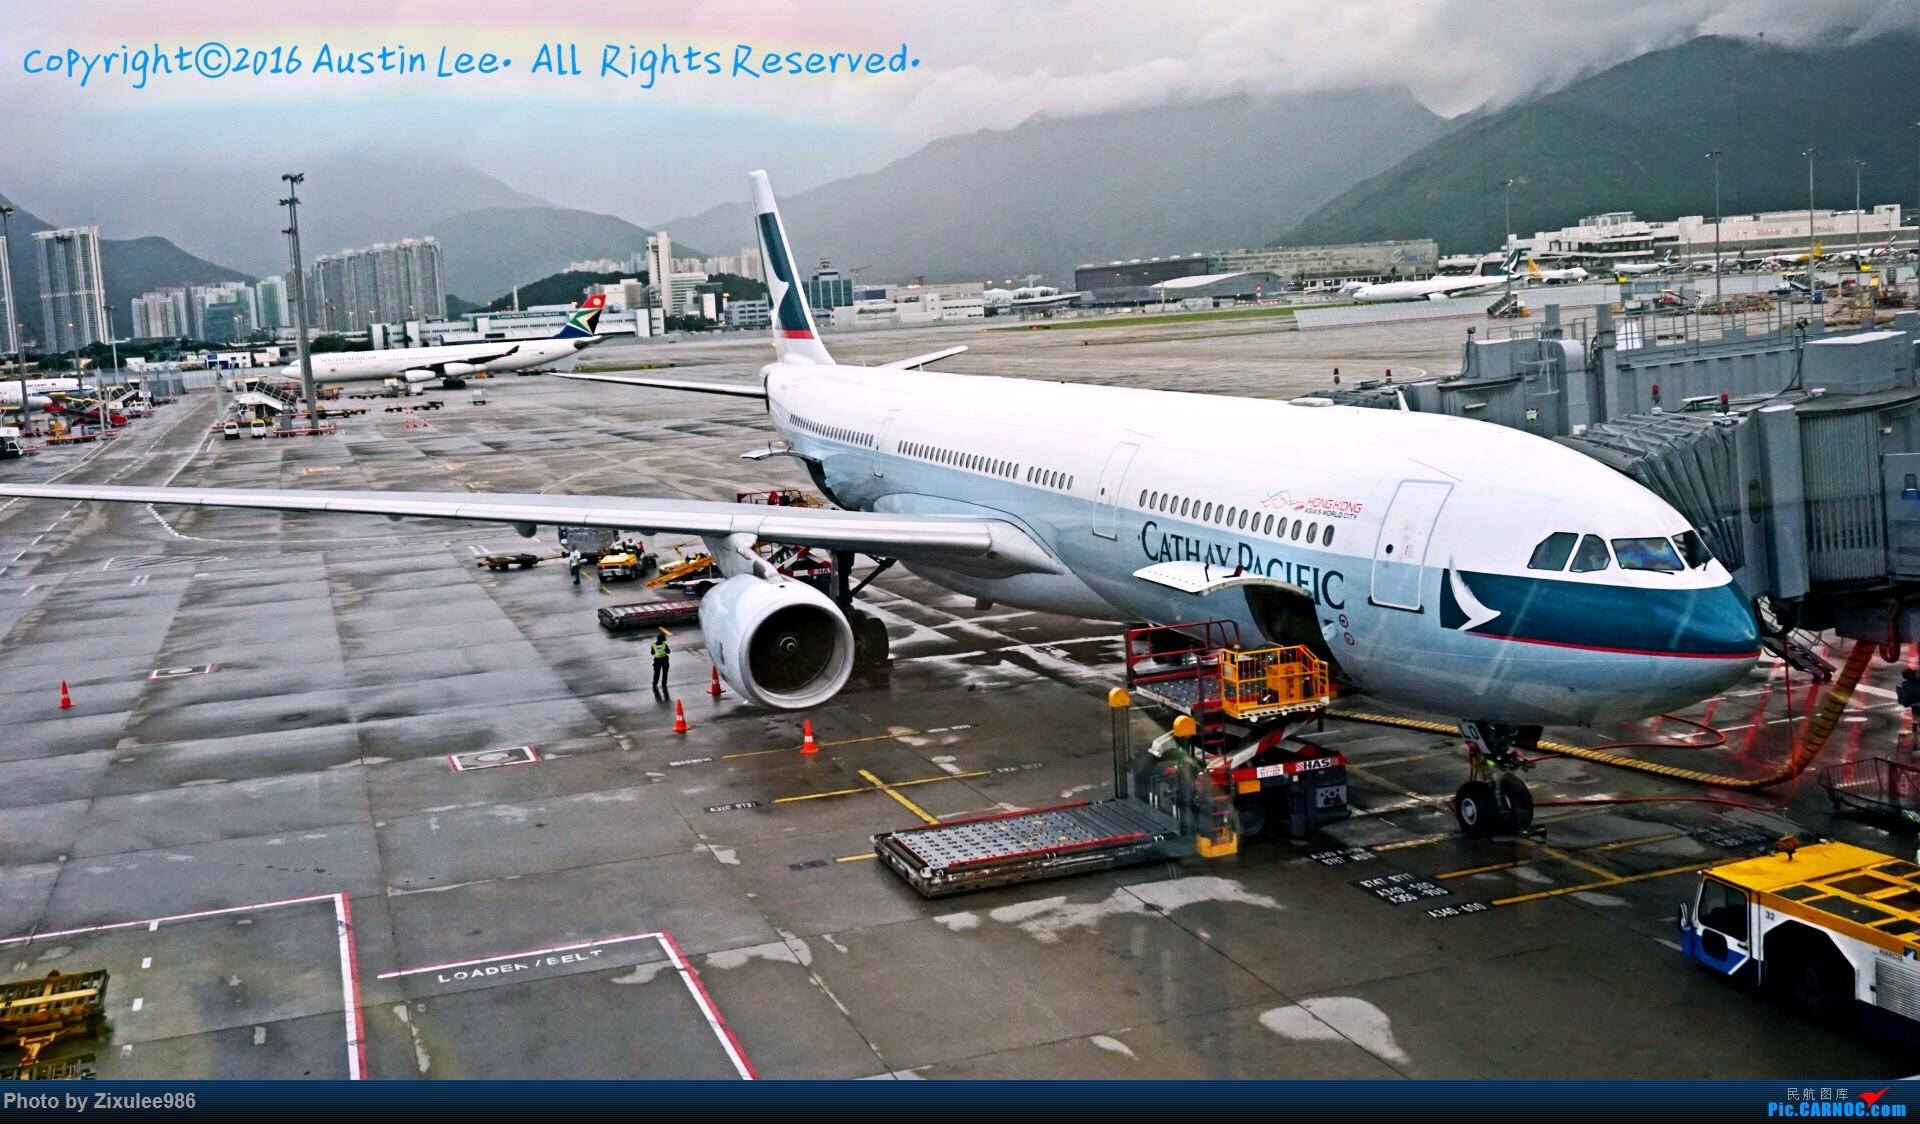 Re:[原创]论坛修复后第一波~三年来旅游途中的拍机精选~不定时更新 AIRBUS A330-343 B-HLO 中国香港国际机场